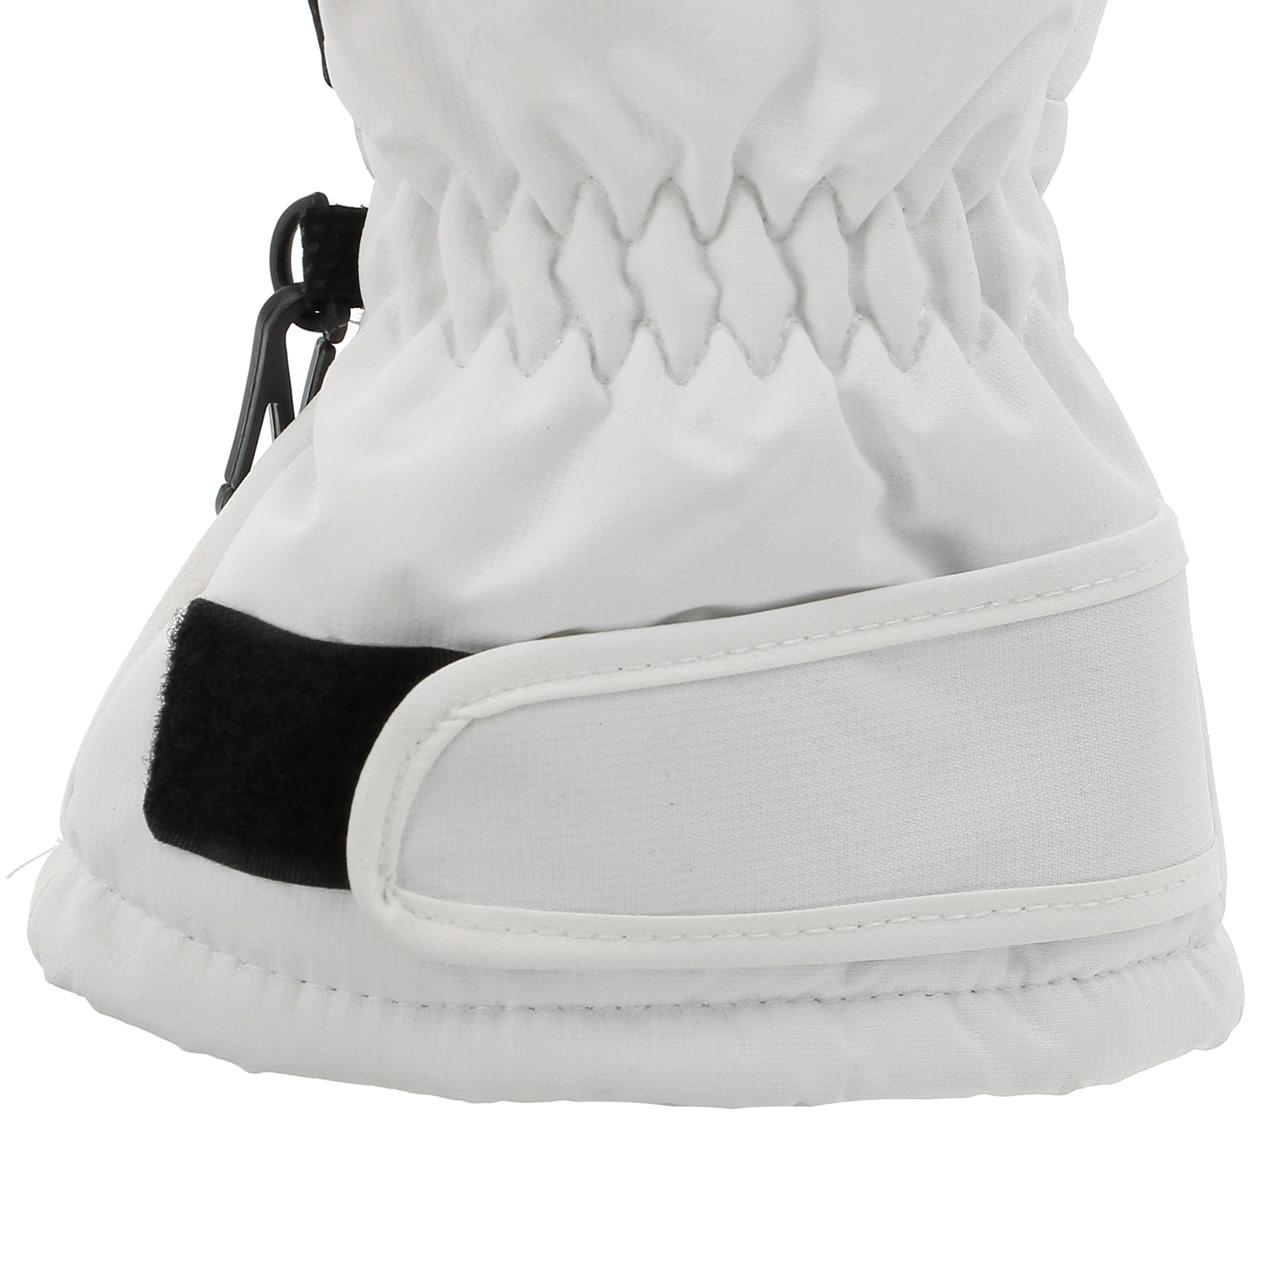 Gants-de-ski-Icepeak-Diisa-blanc-gants-ski-l-Blanc-14370-Neuf miniature 3